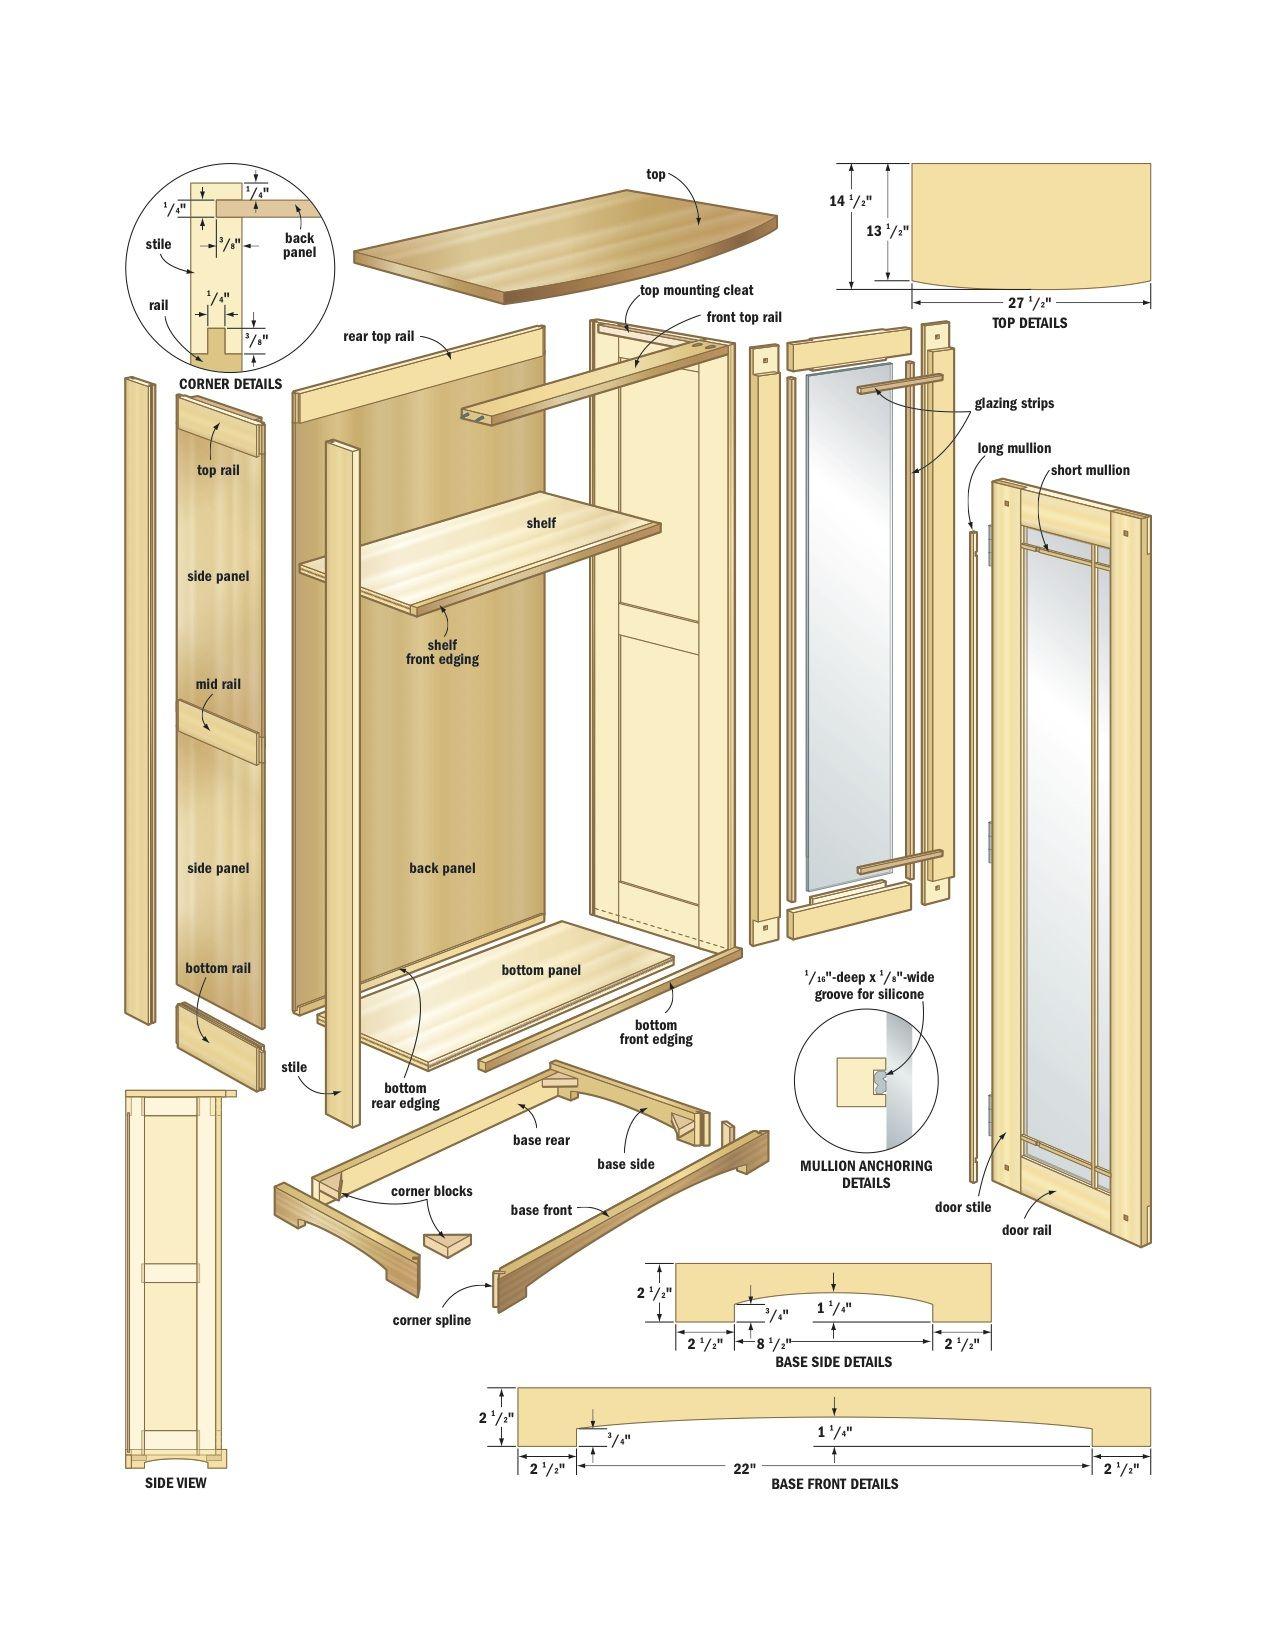 Build An Elegant Media Cabinet Canadian Home Workshop Cabinet Woodworking Plans Woodworking Projects Plans Woodworking Plans Pdf